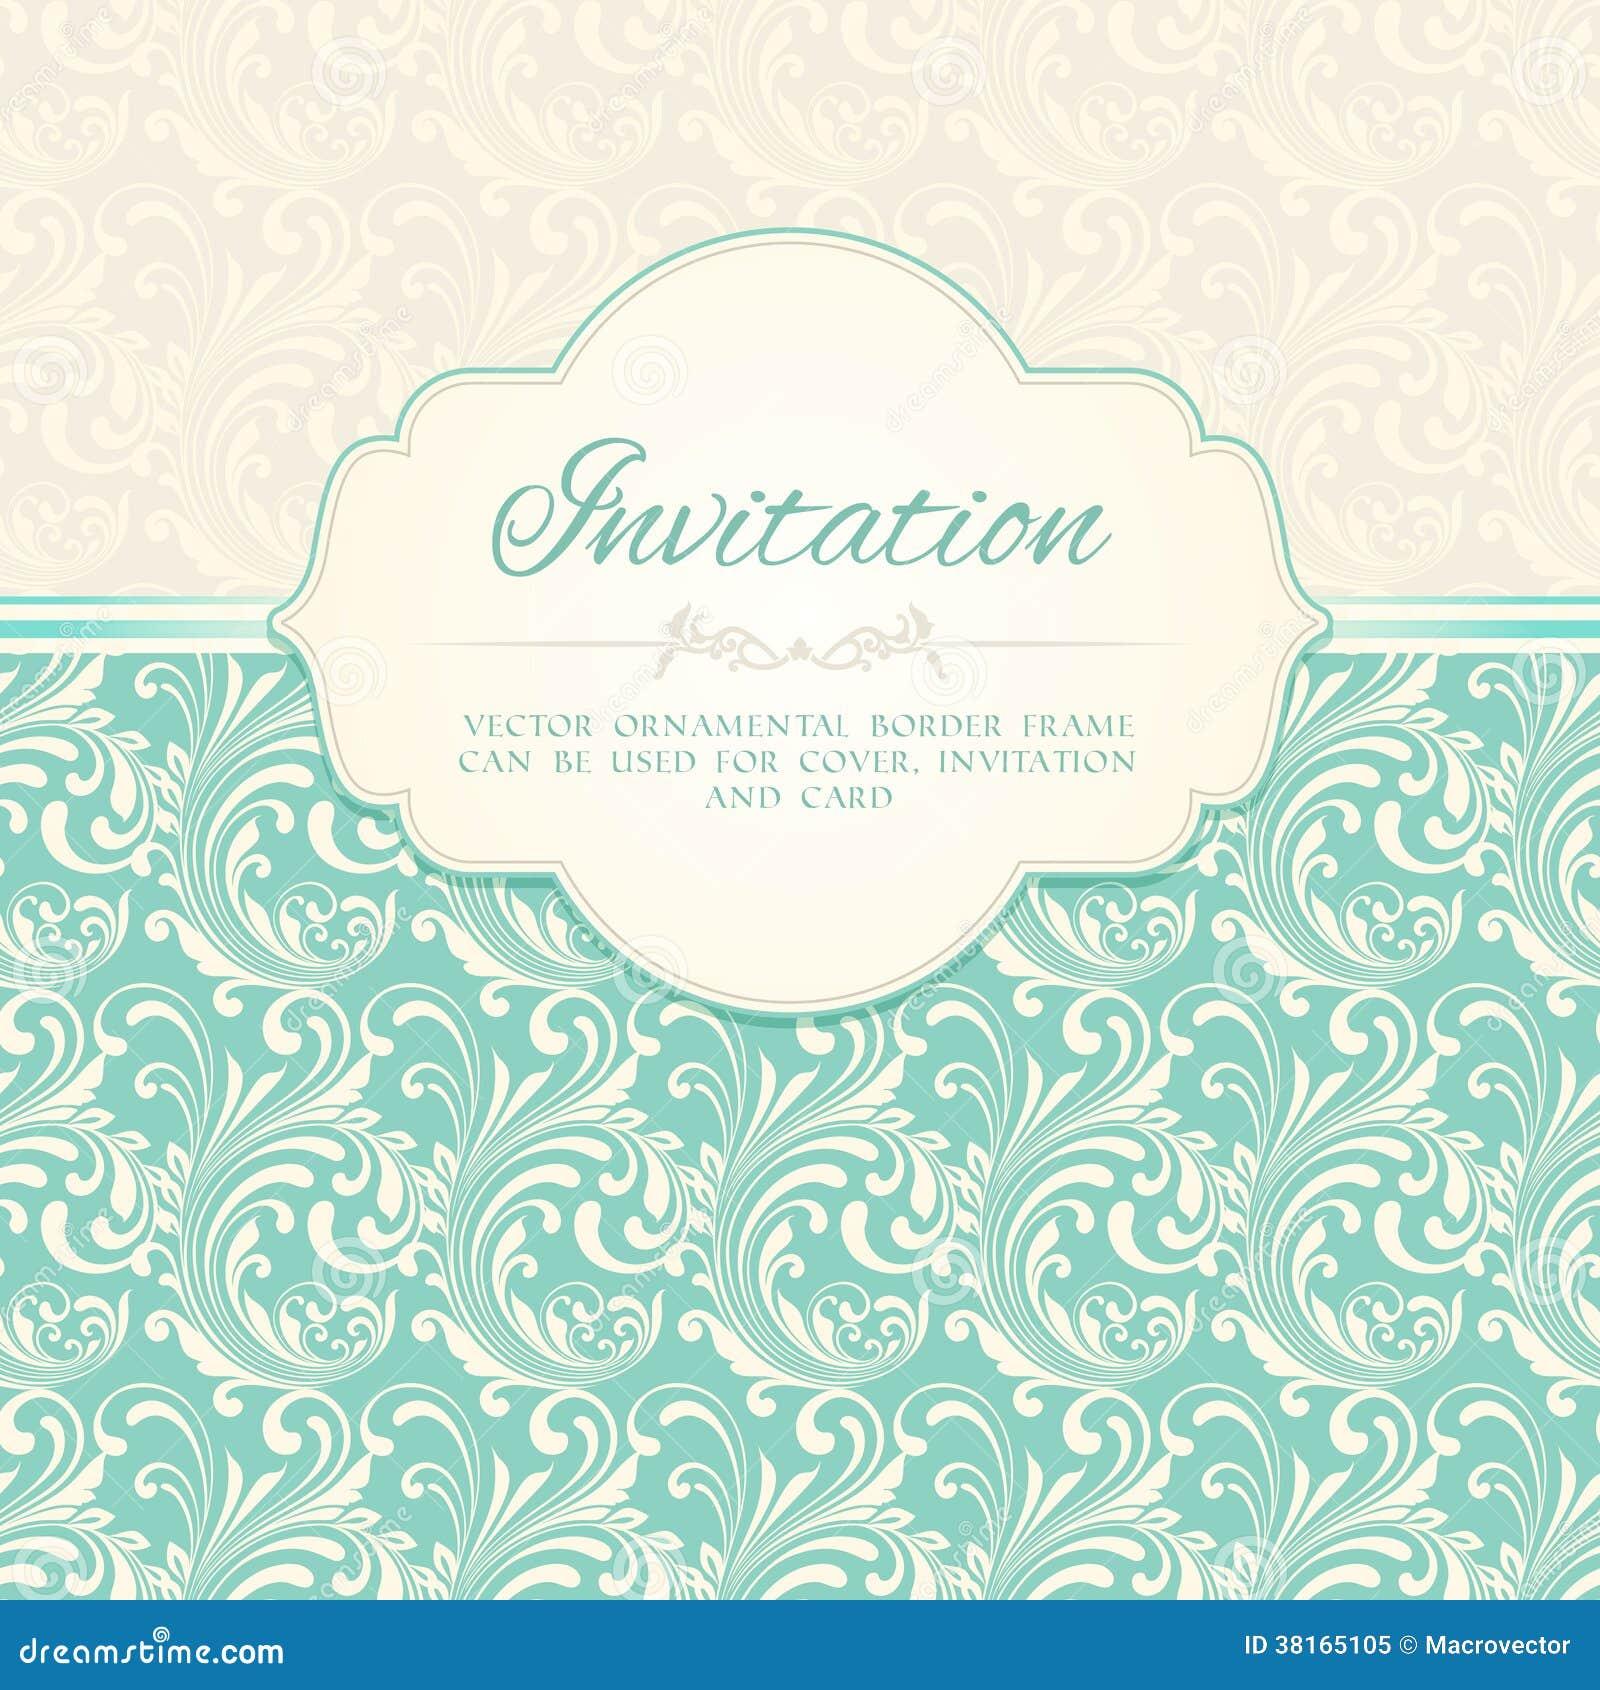 Ornamental Pattern Invitation Card Royalty Free Stock